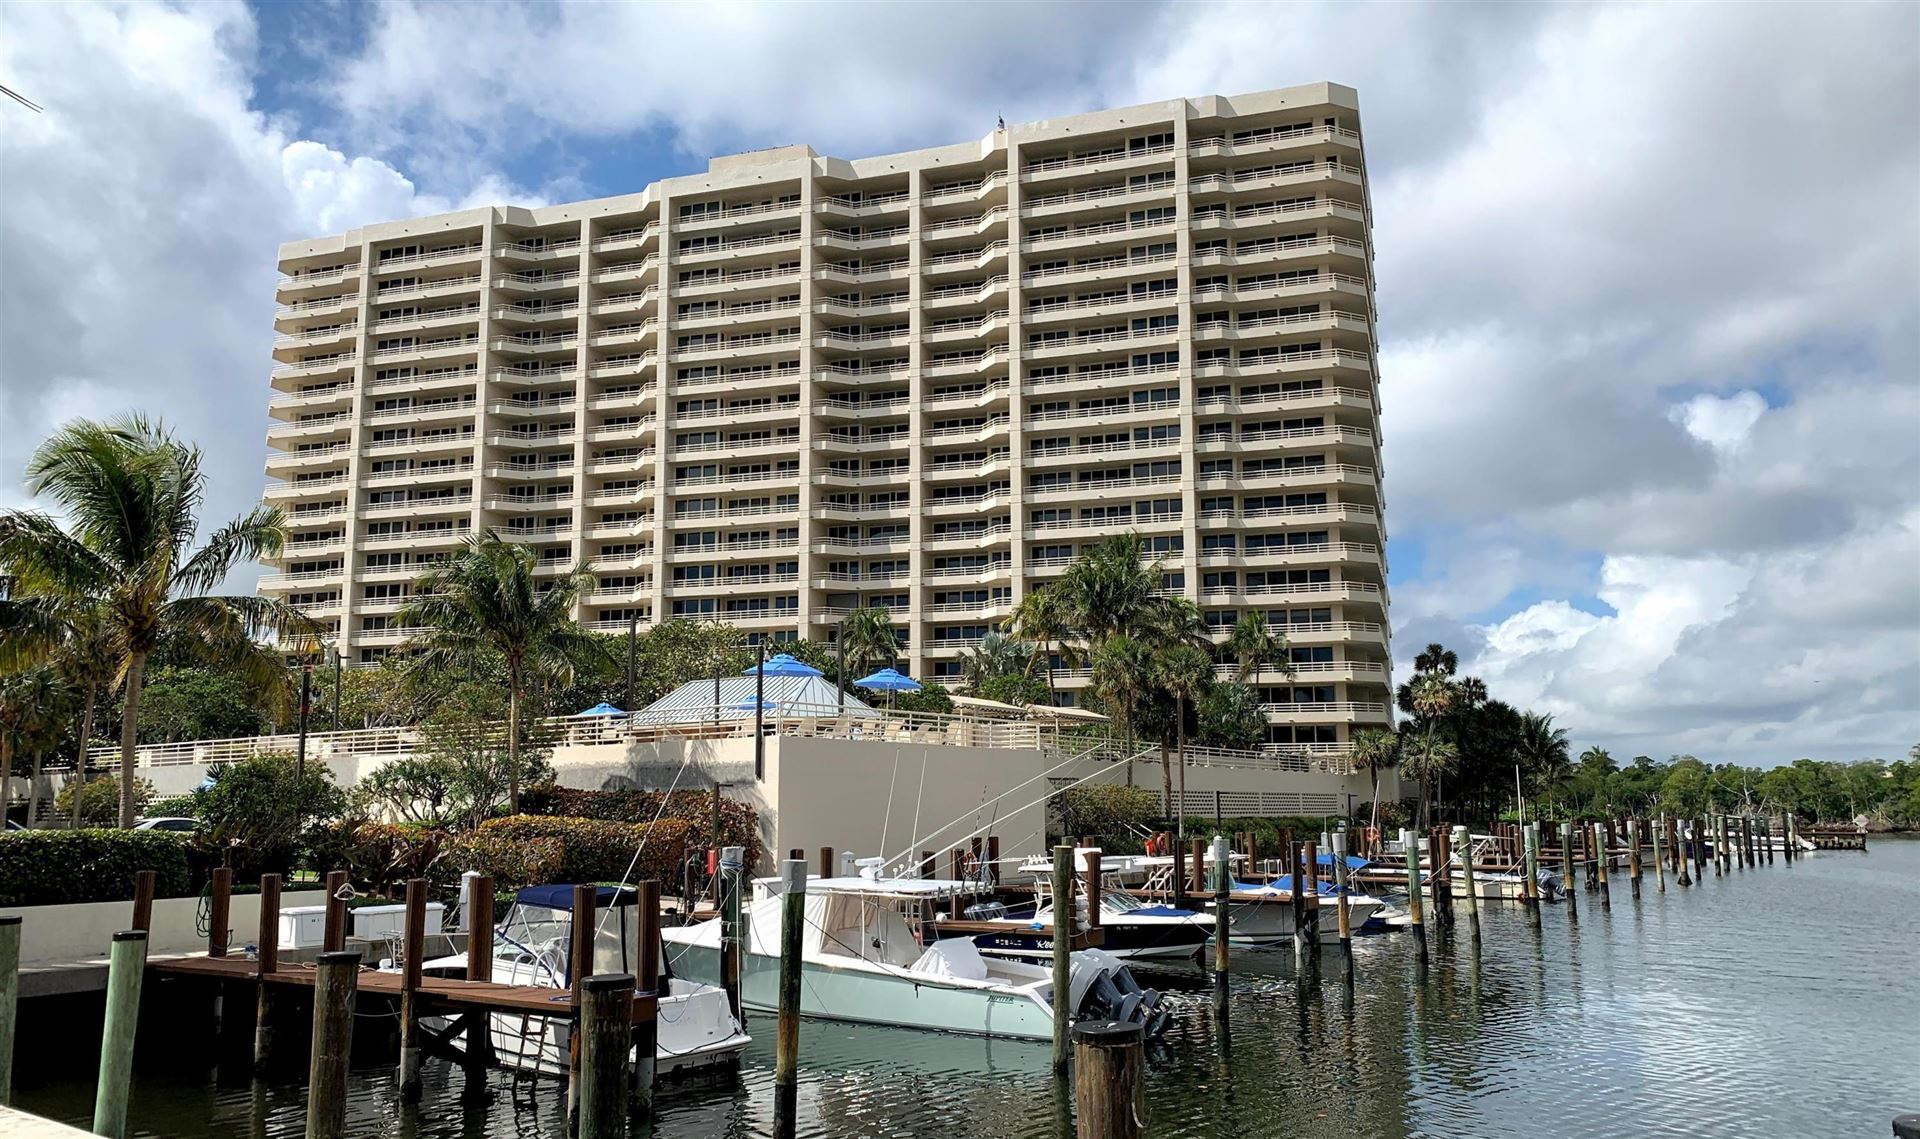 Photo of 4101 N Ocean Boulevard #304 D, Boca Raton, FL 33431 (MLS # RX-10696299)